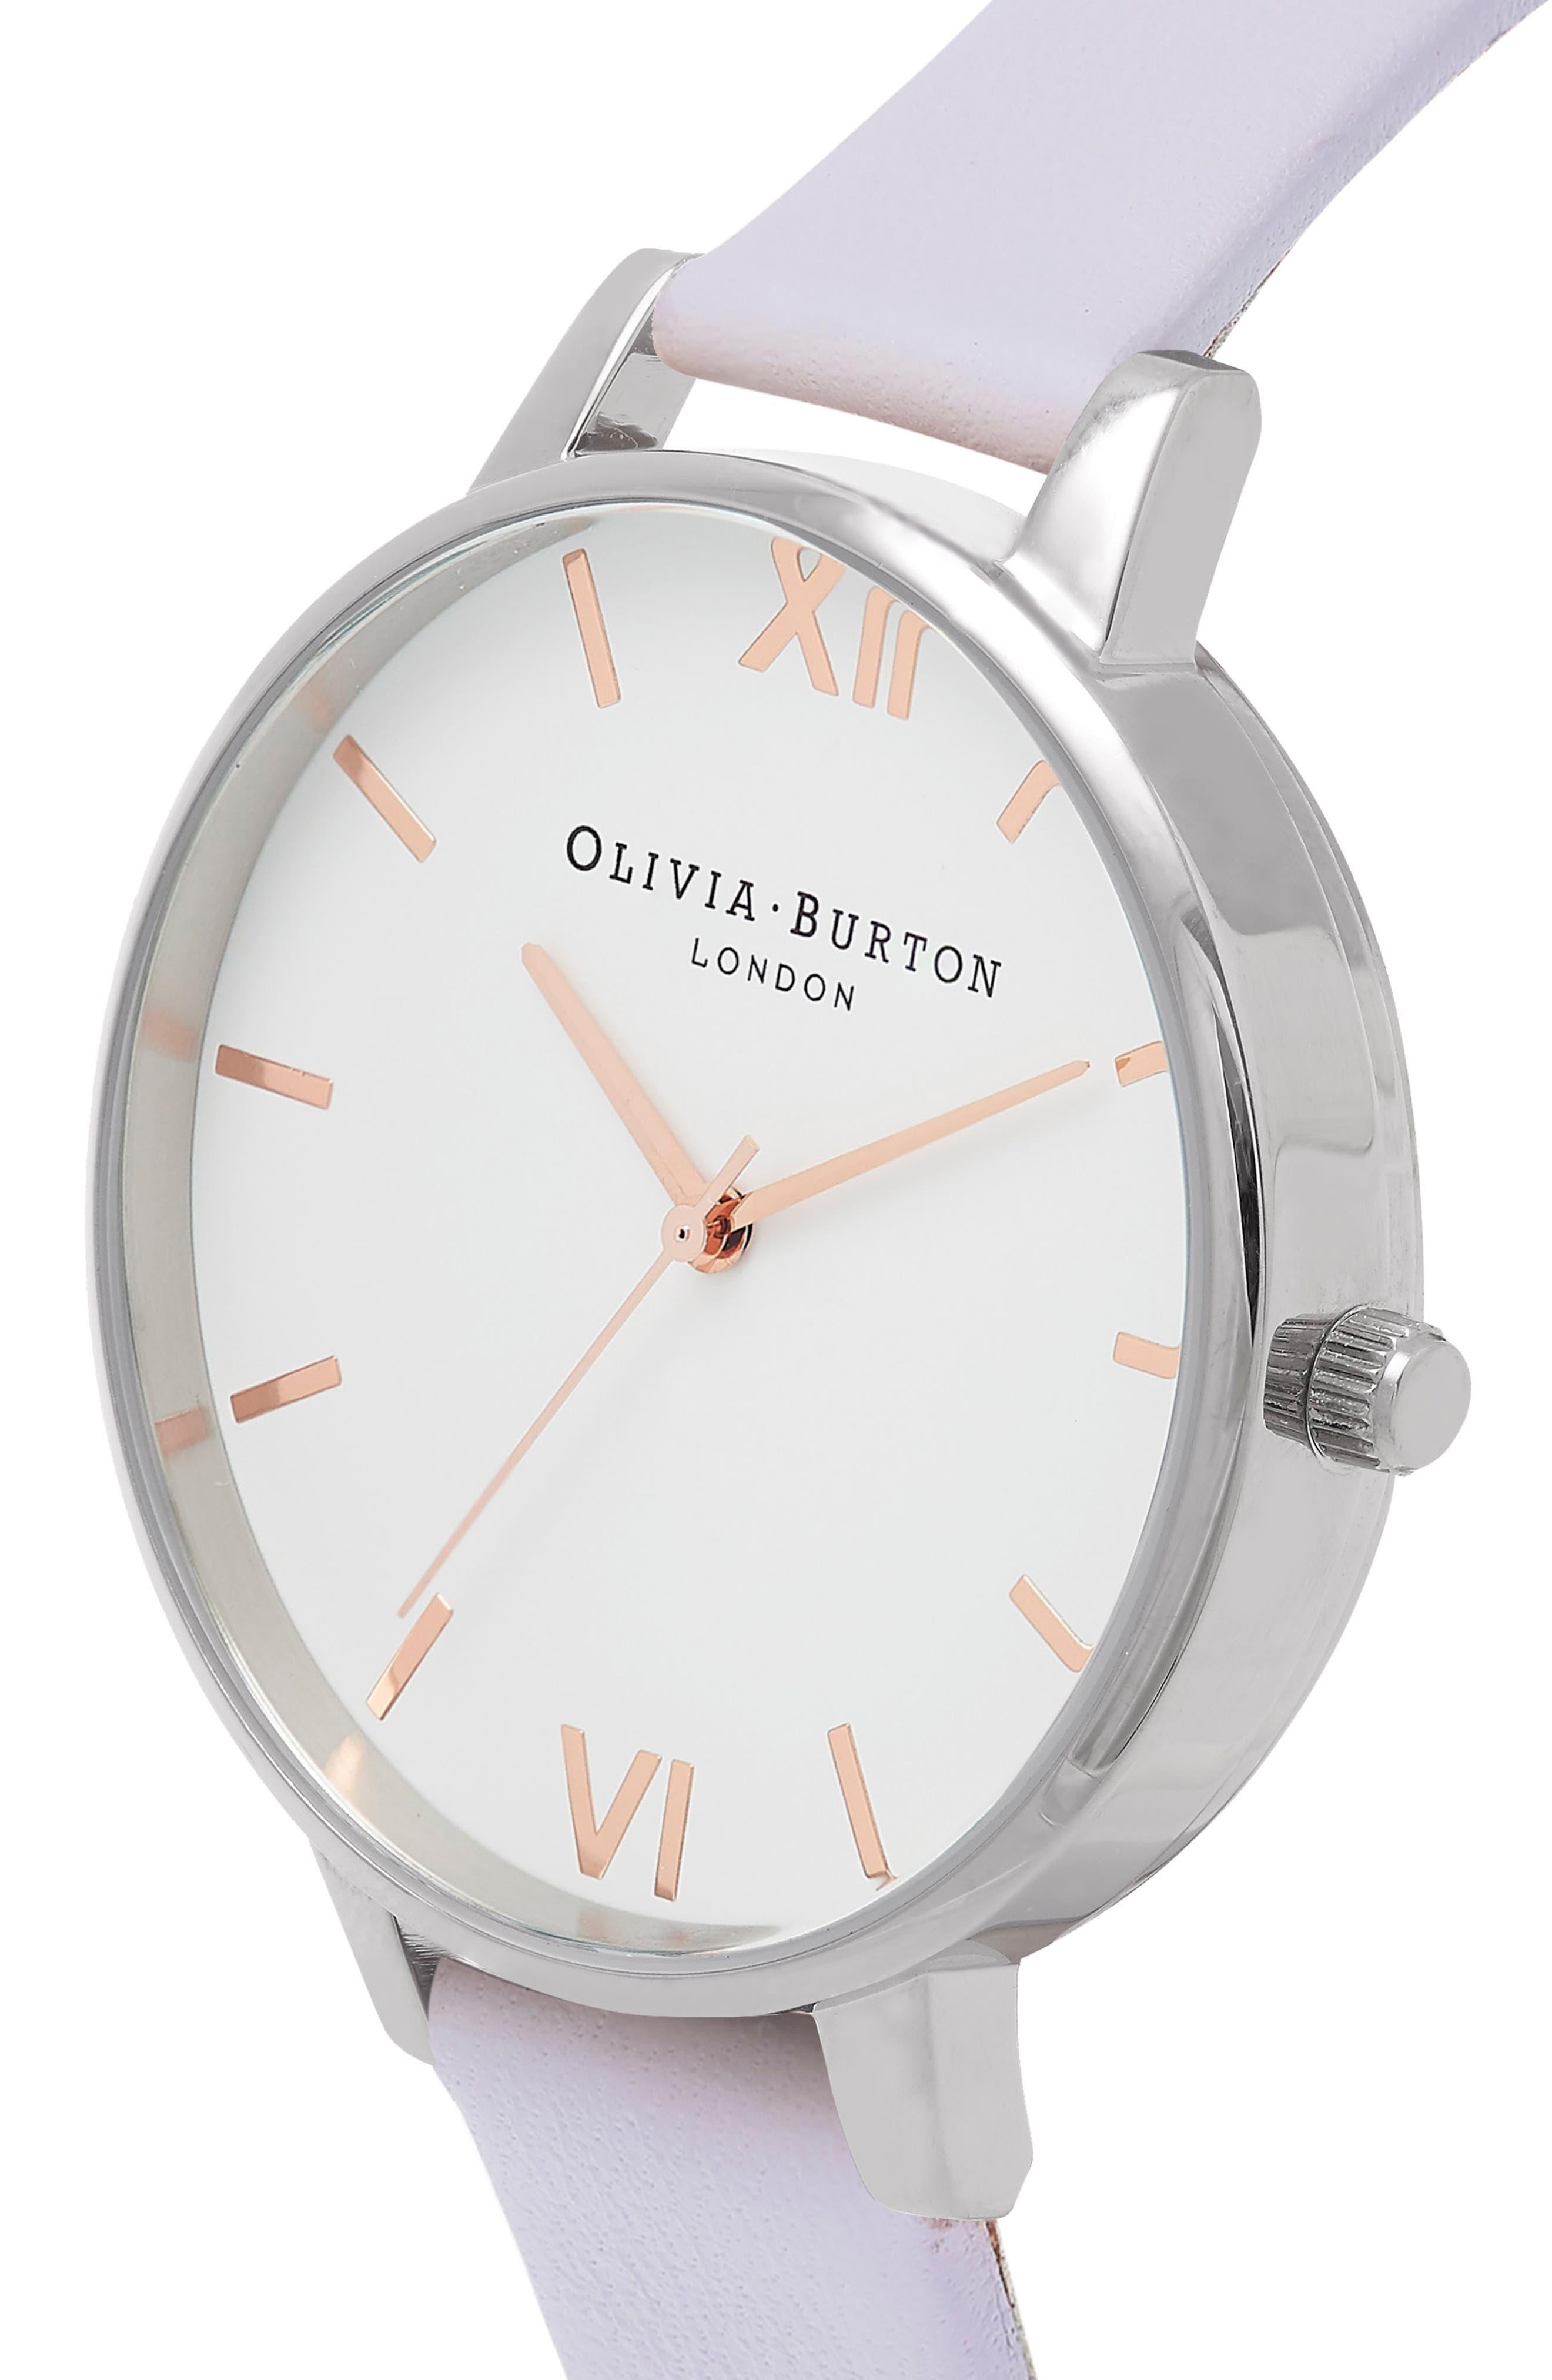 OLIVIA BURTON, White Dial Leather Strap Watch, 38mm, Alternate thumbnail 4, color, VIOLET/ WHITE/ SILVER